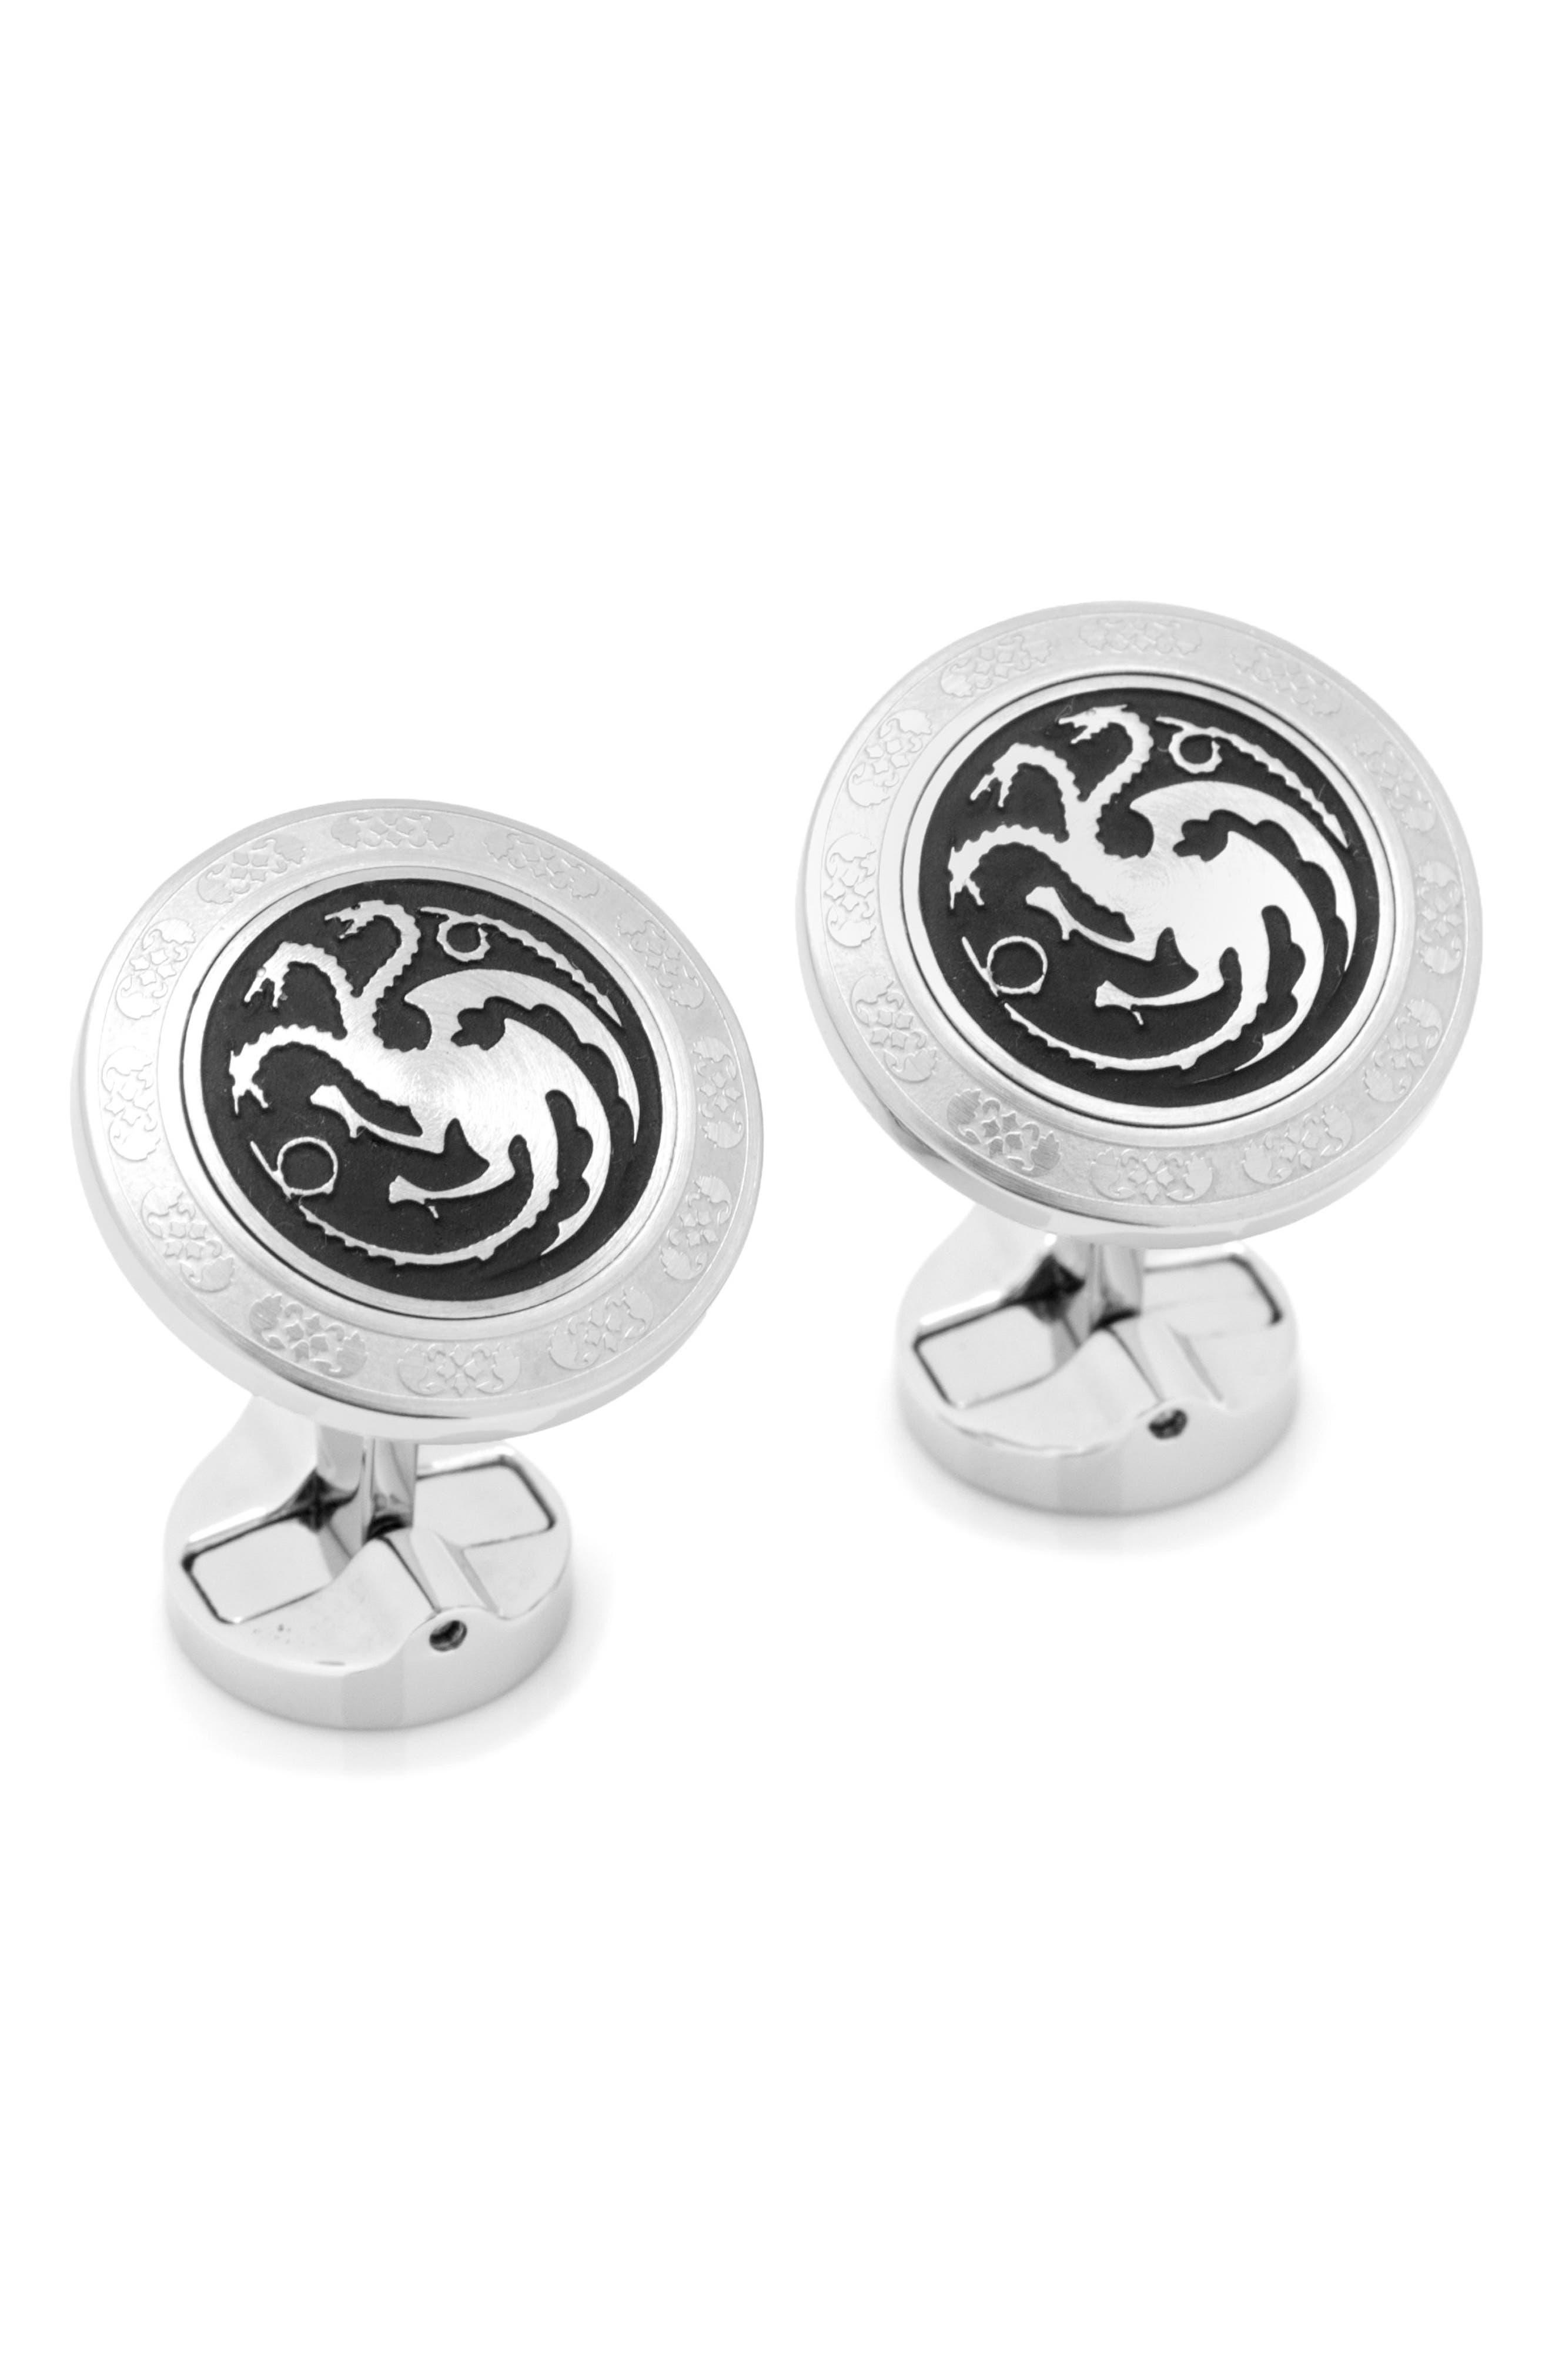 Targaryen Cuff Links,                         Main,                         color, SILVER/ BLACK